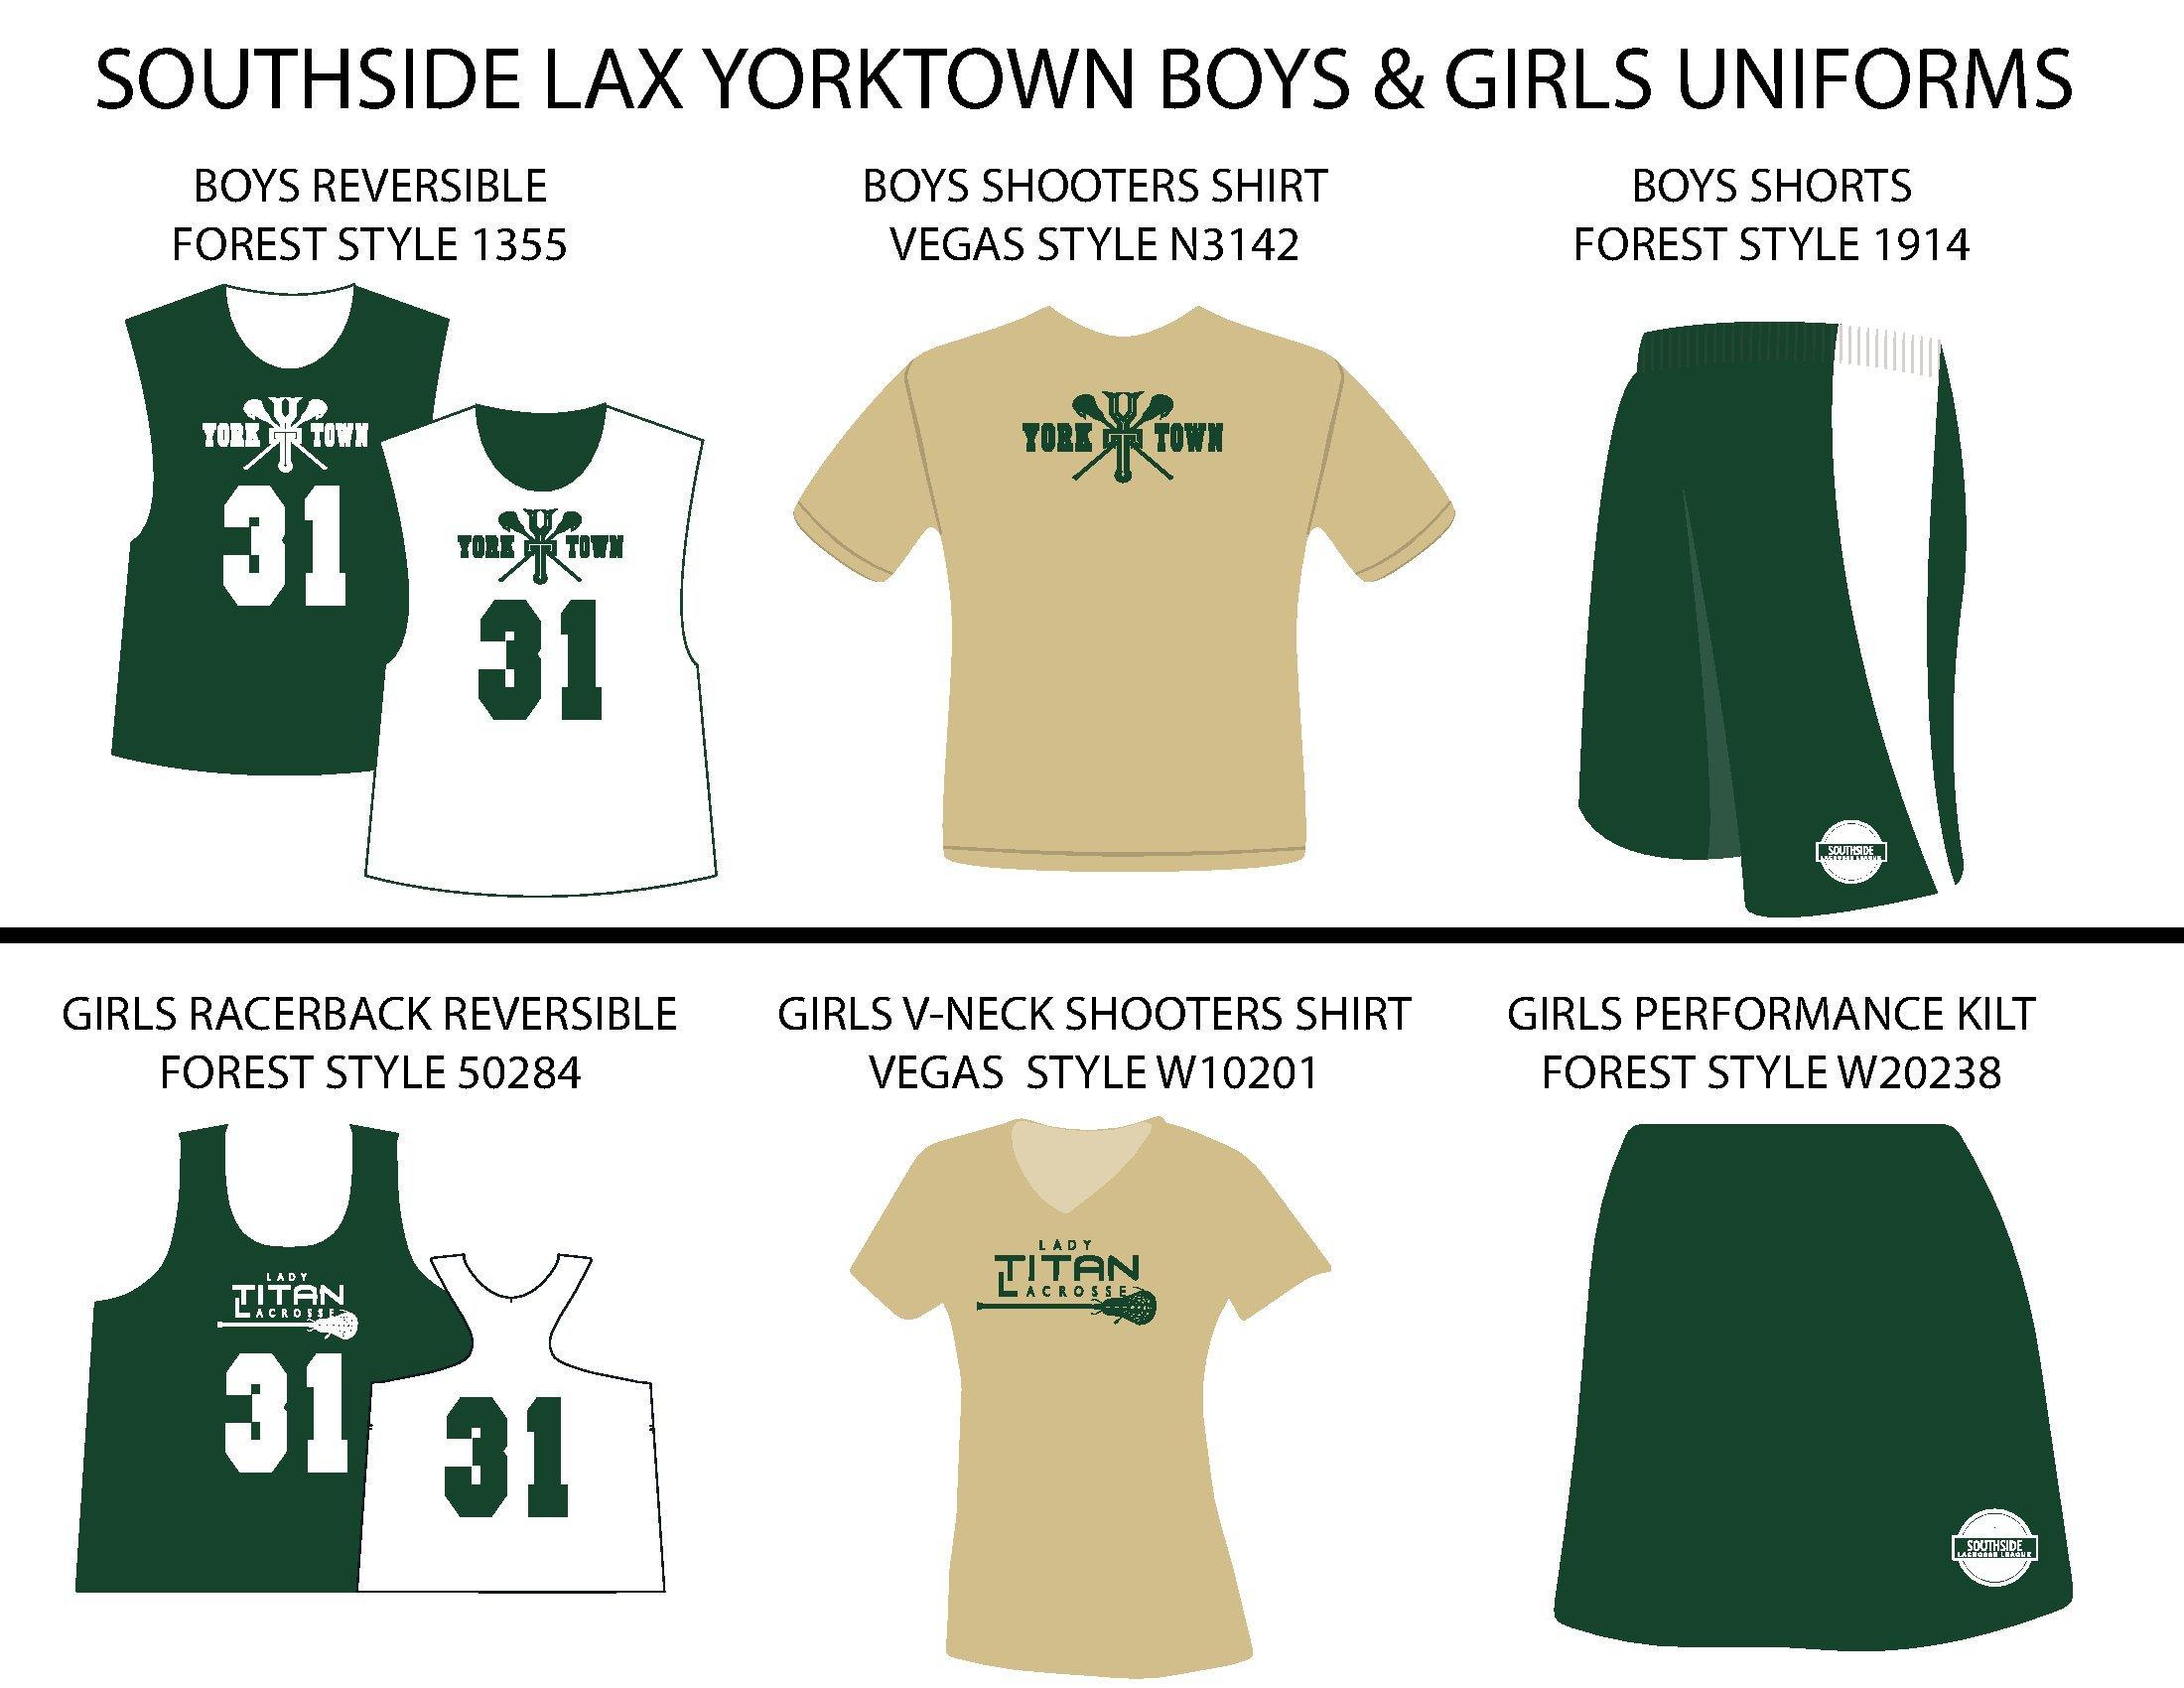 Southside Lacrosse Norfolk Uniform